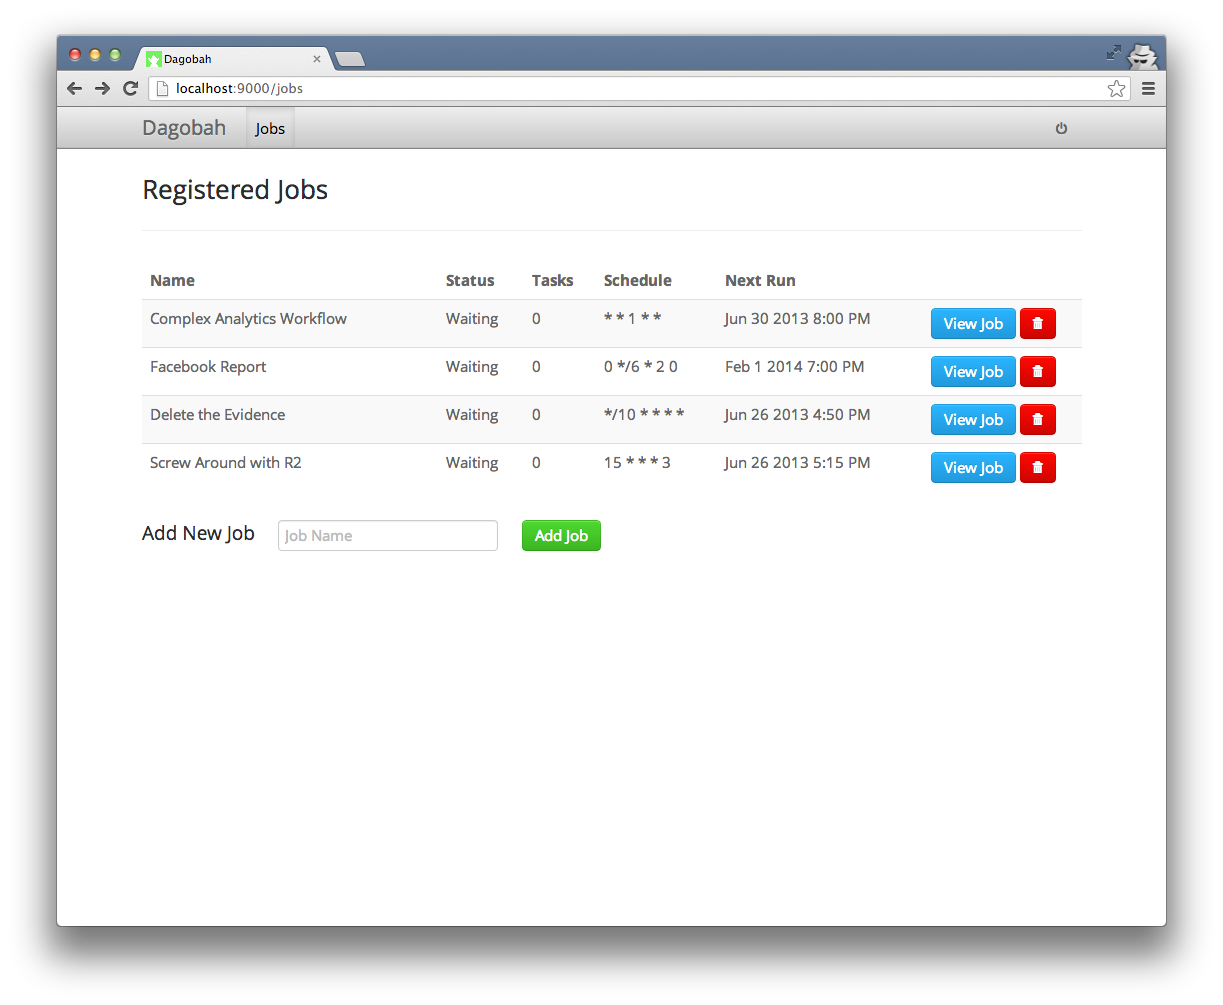 GitHub - thieman/dagobah: Simple DAG-based job scheduler in